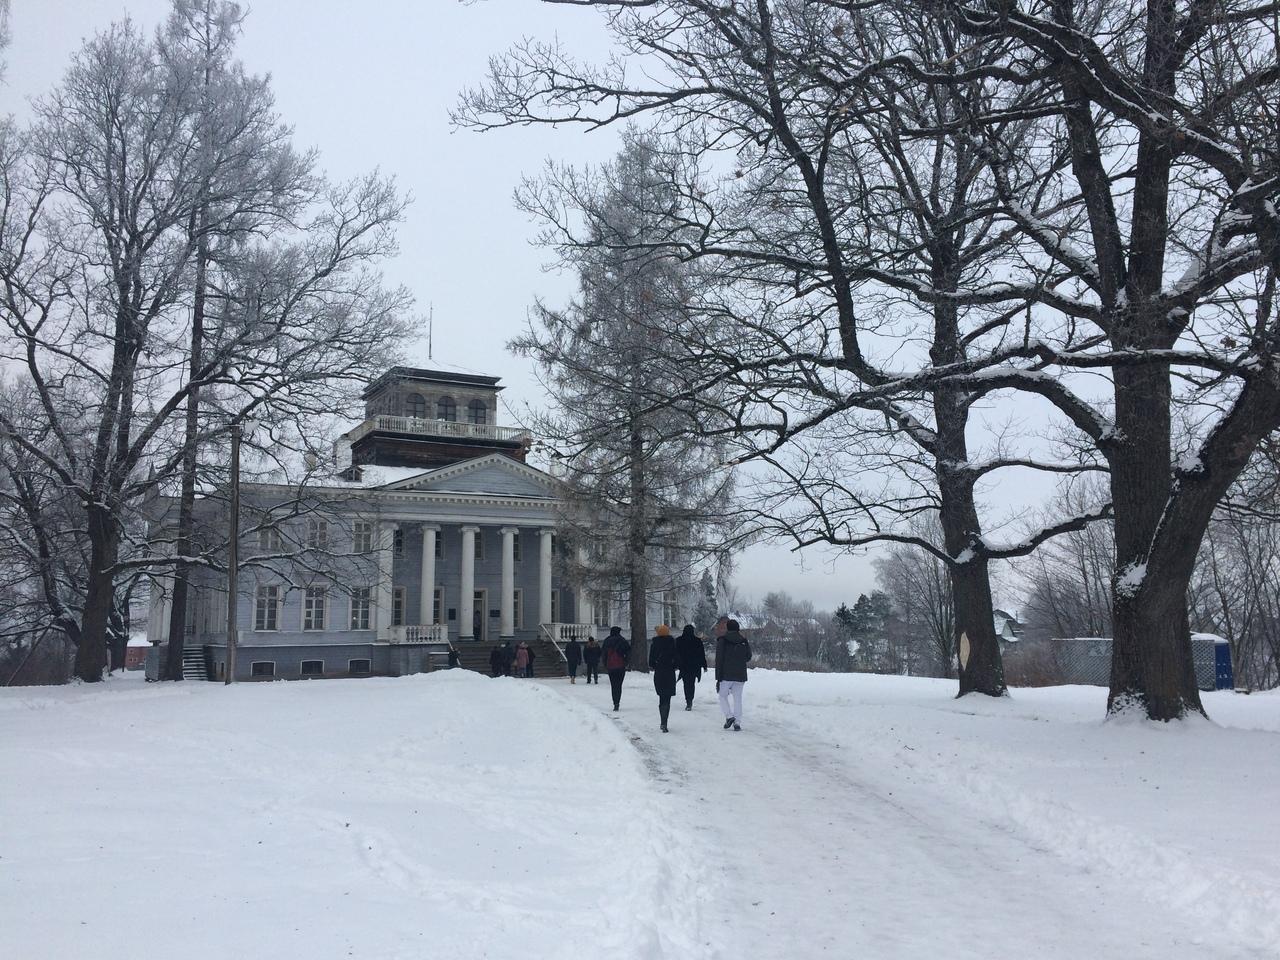 «Физики и лирики» провели встречу в музее-усадьбе «Рождествено»